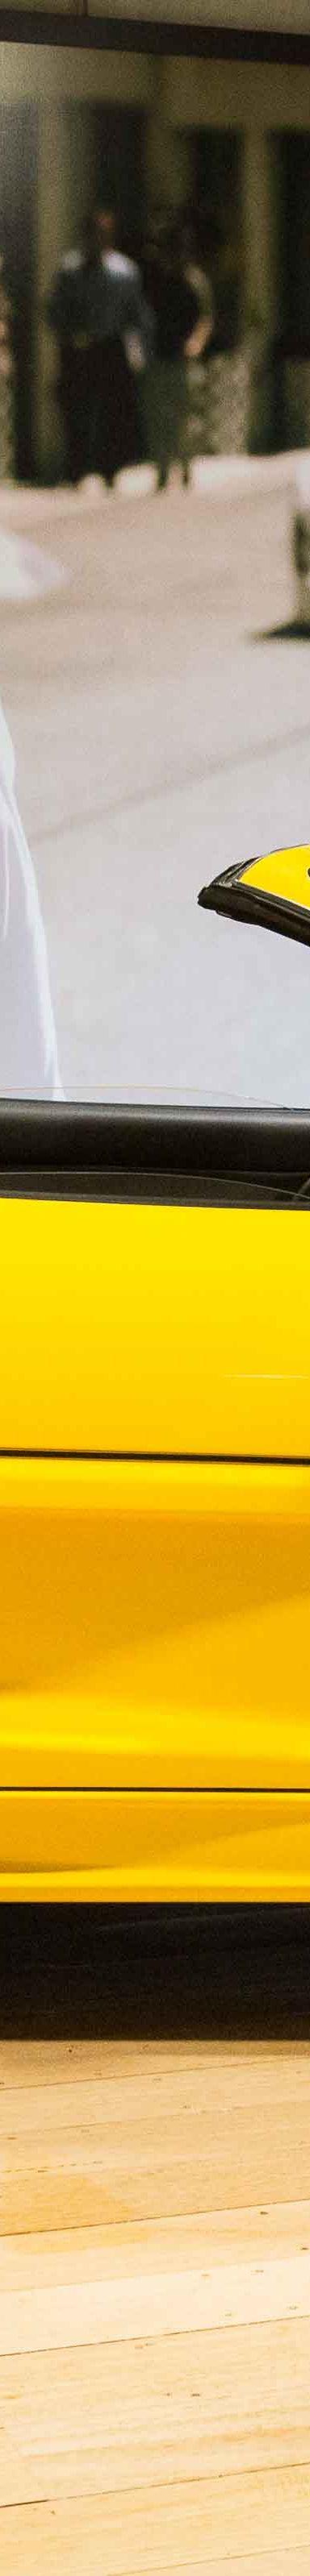 1987 Ferrari 355 GTS- sold in Australia